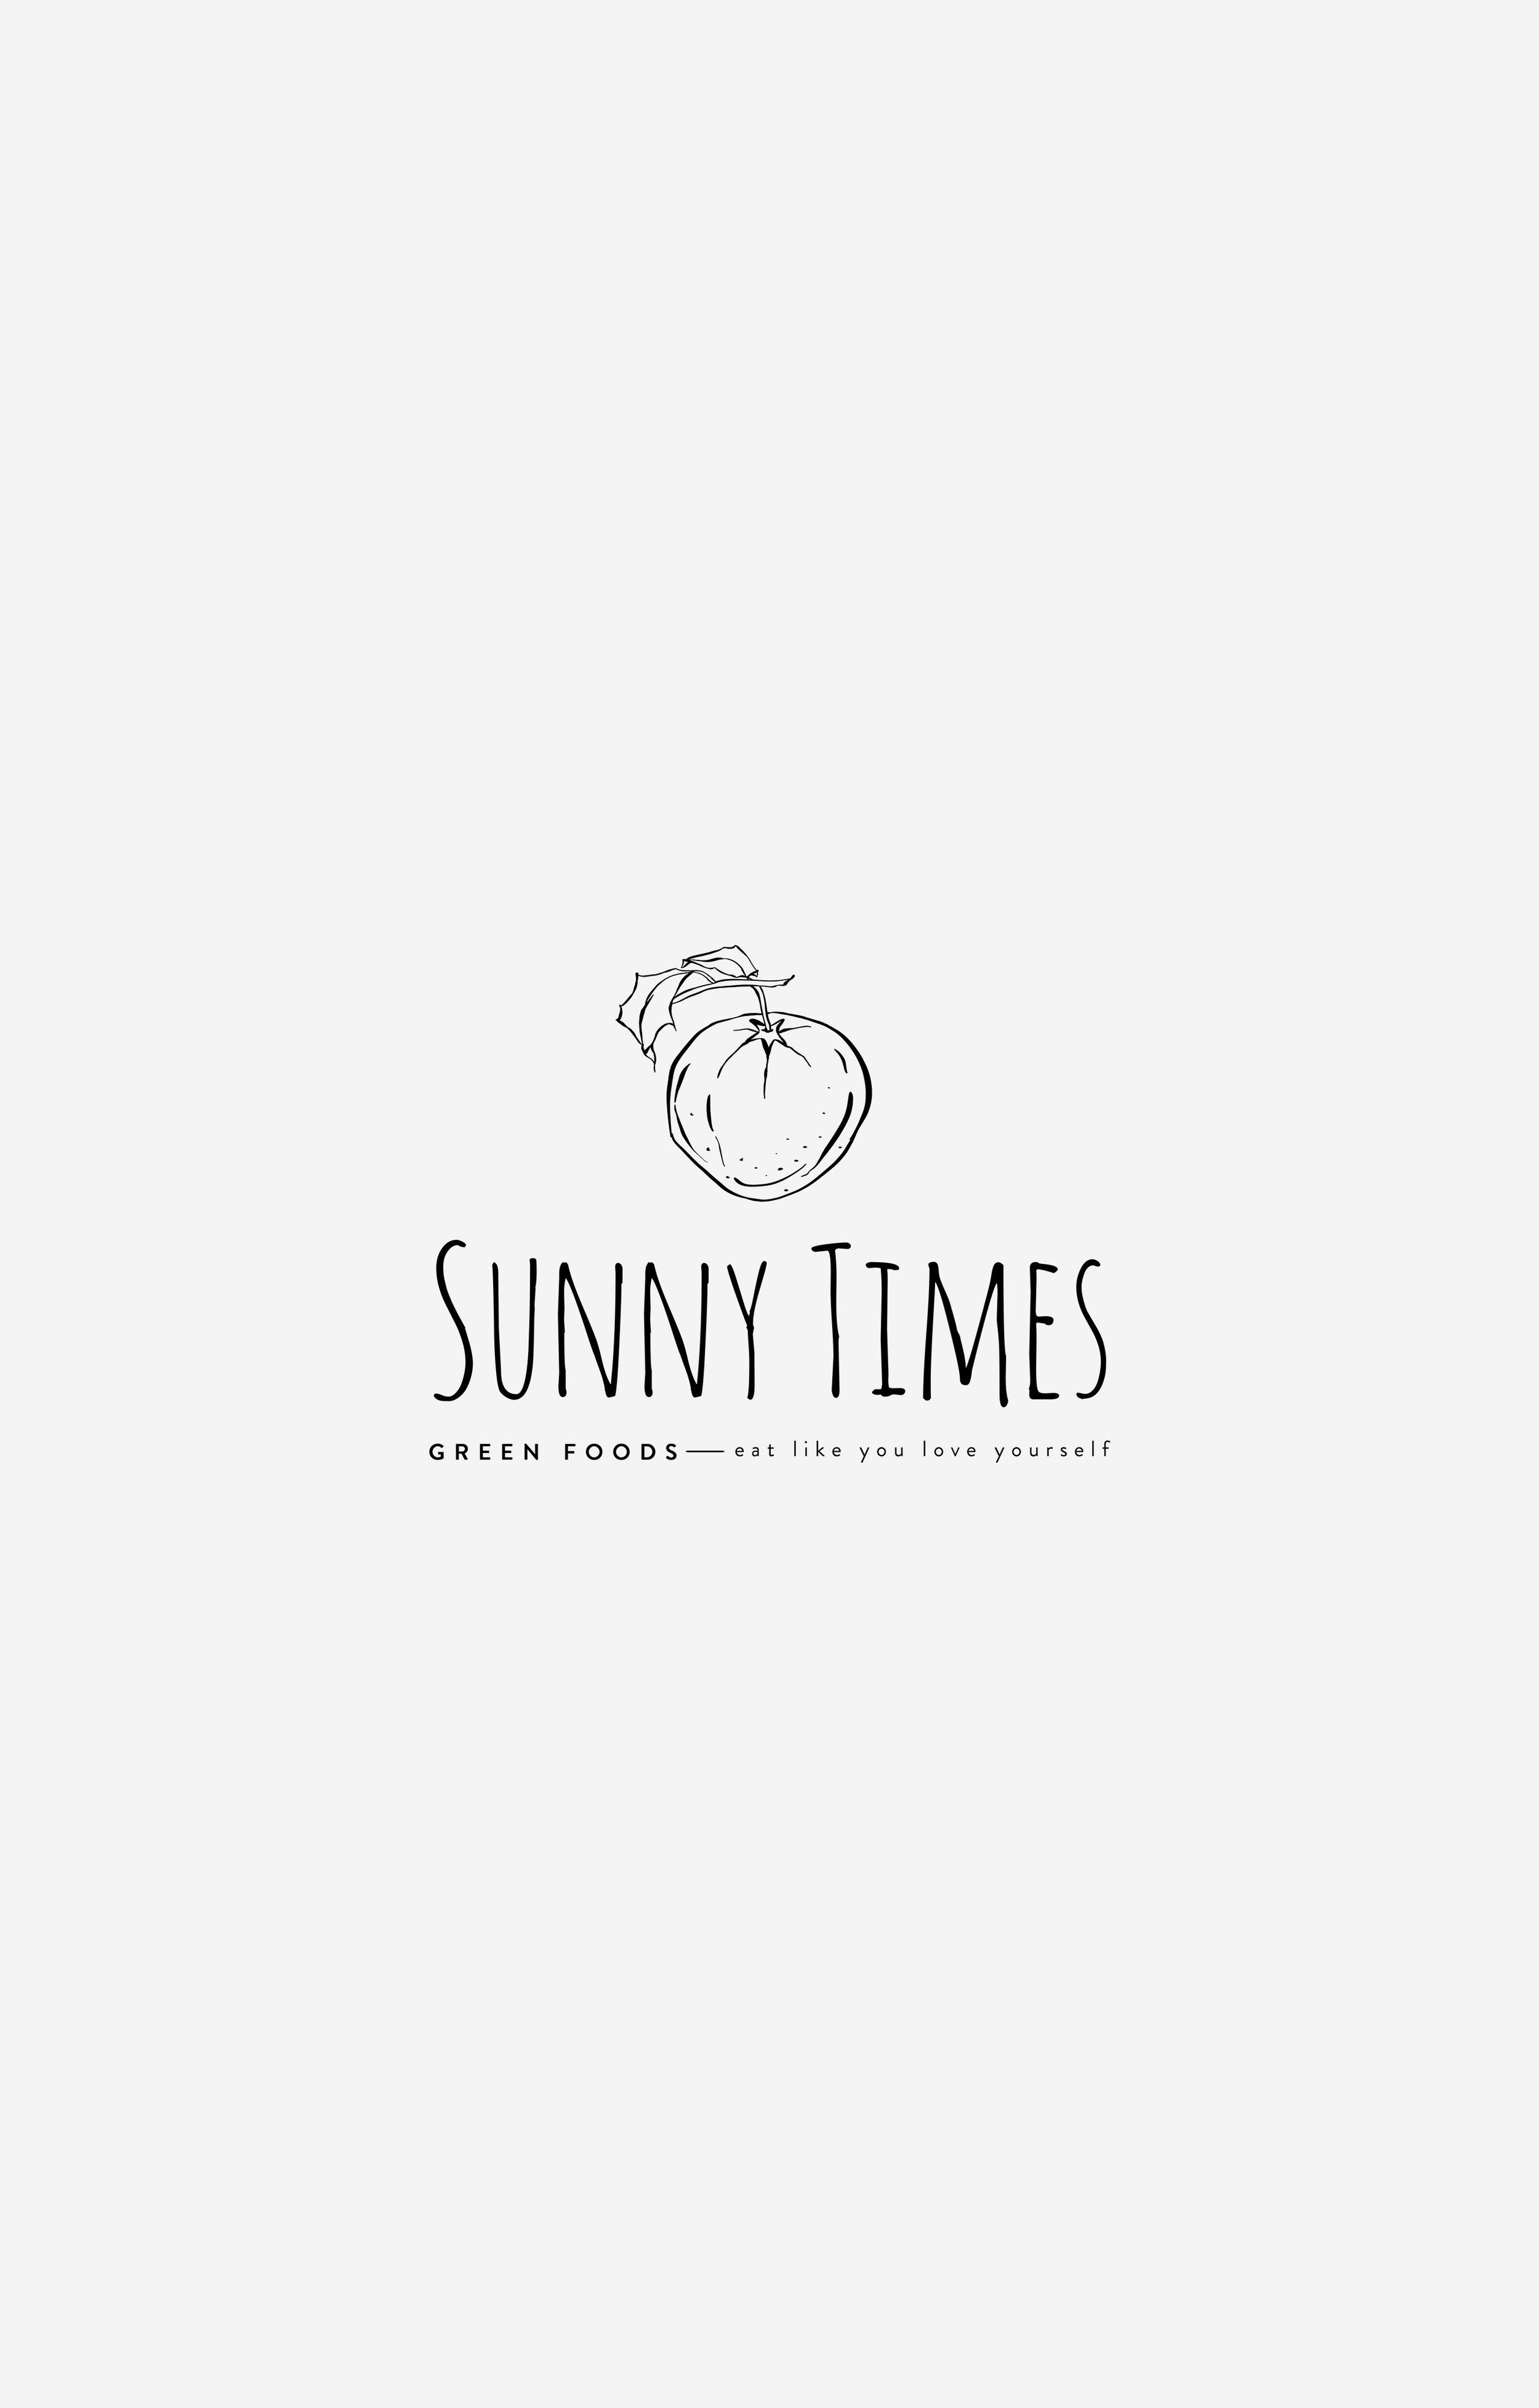 sunny-times-portfolio-03.jpg